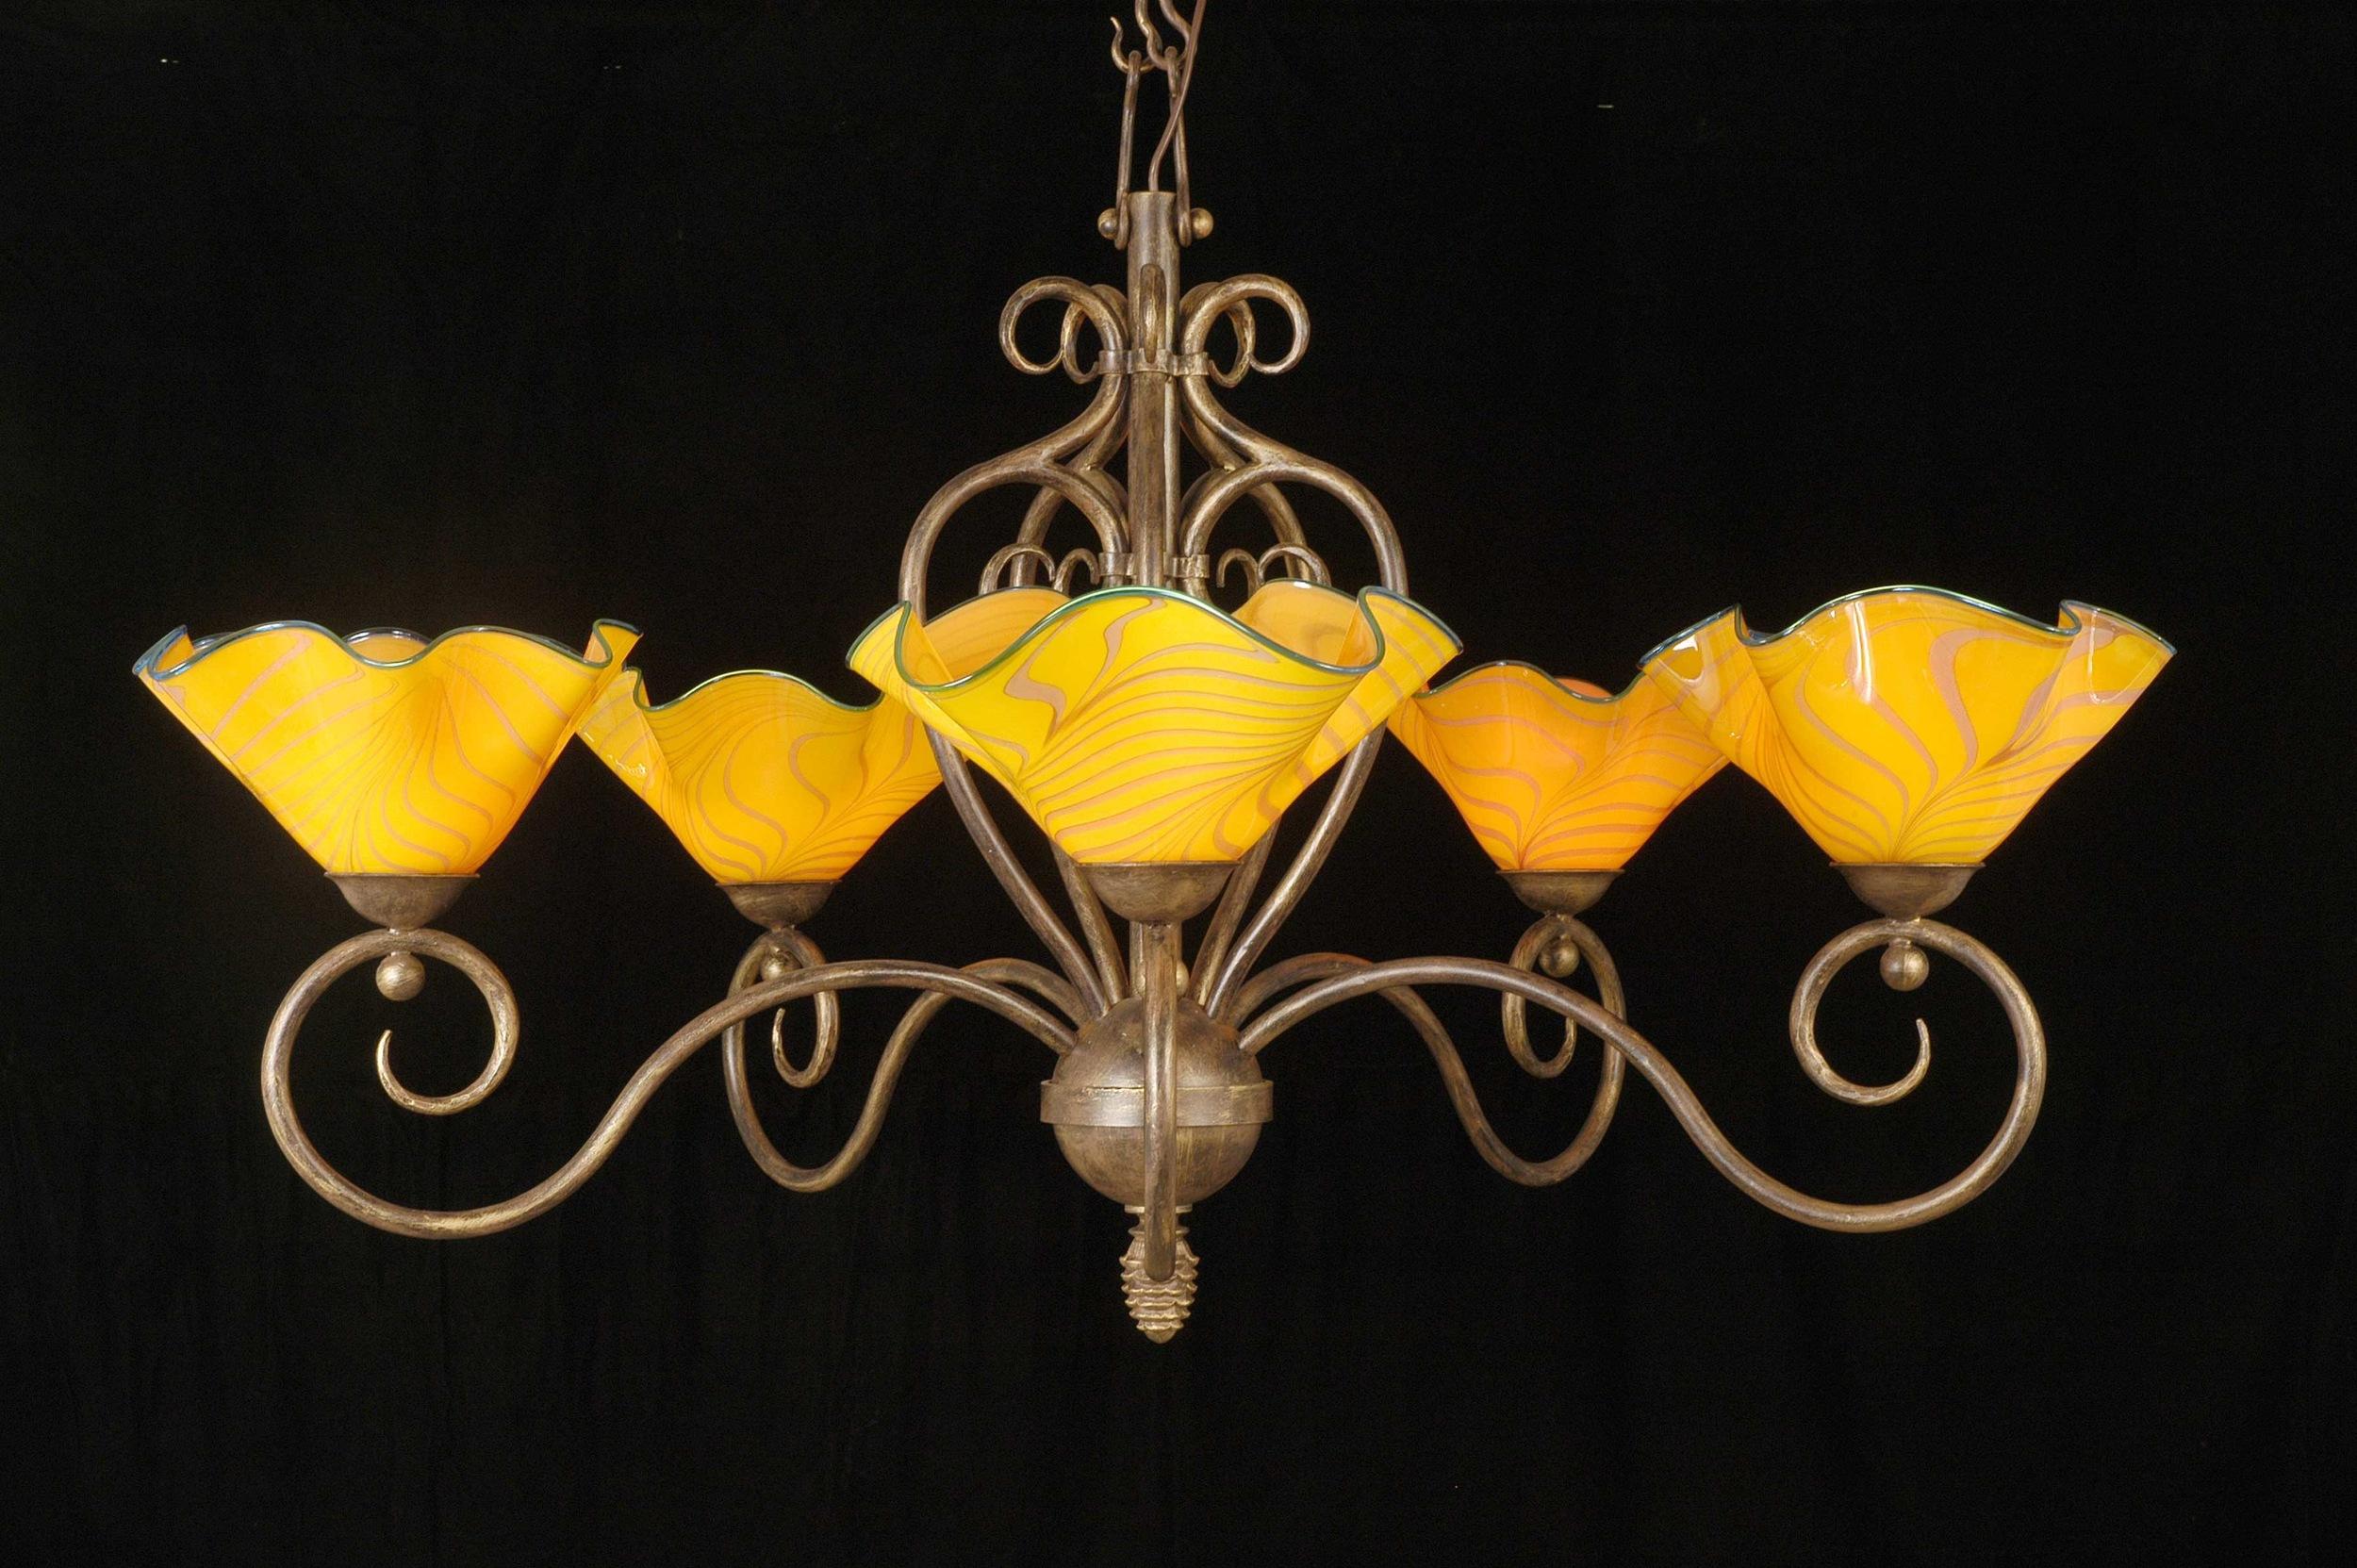 5-light-with-Papaya-on-blk HL2461 on blk.jpg artist rick strini .jpg